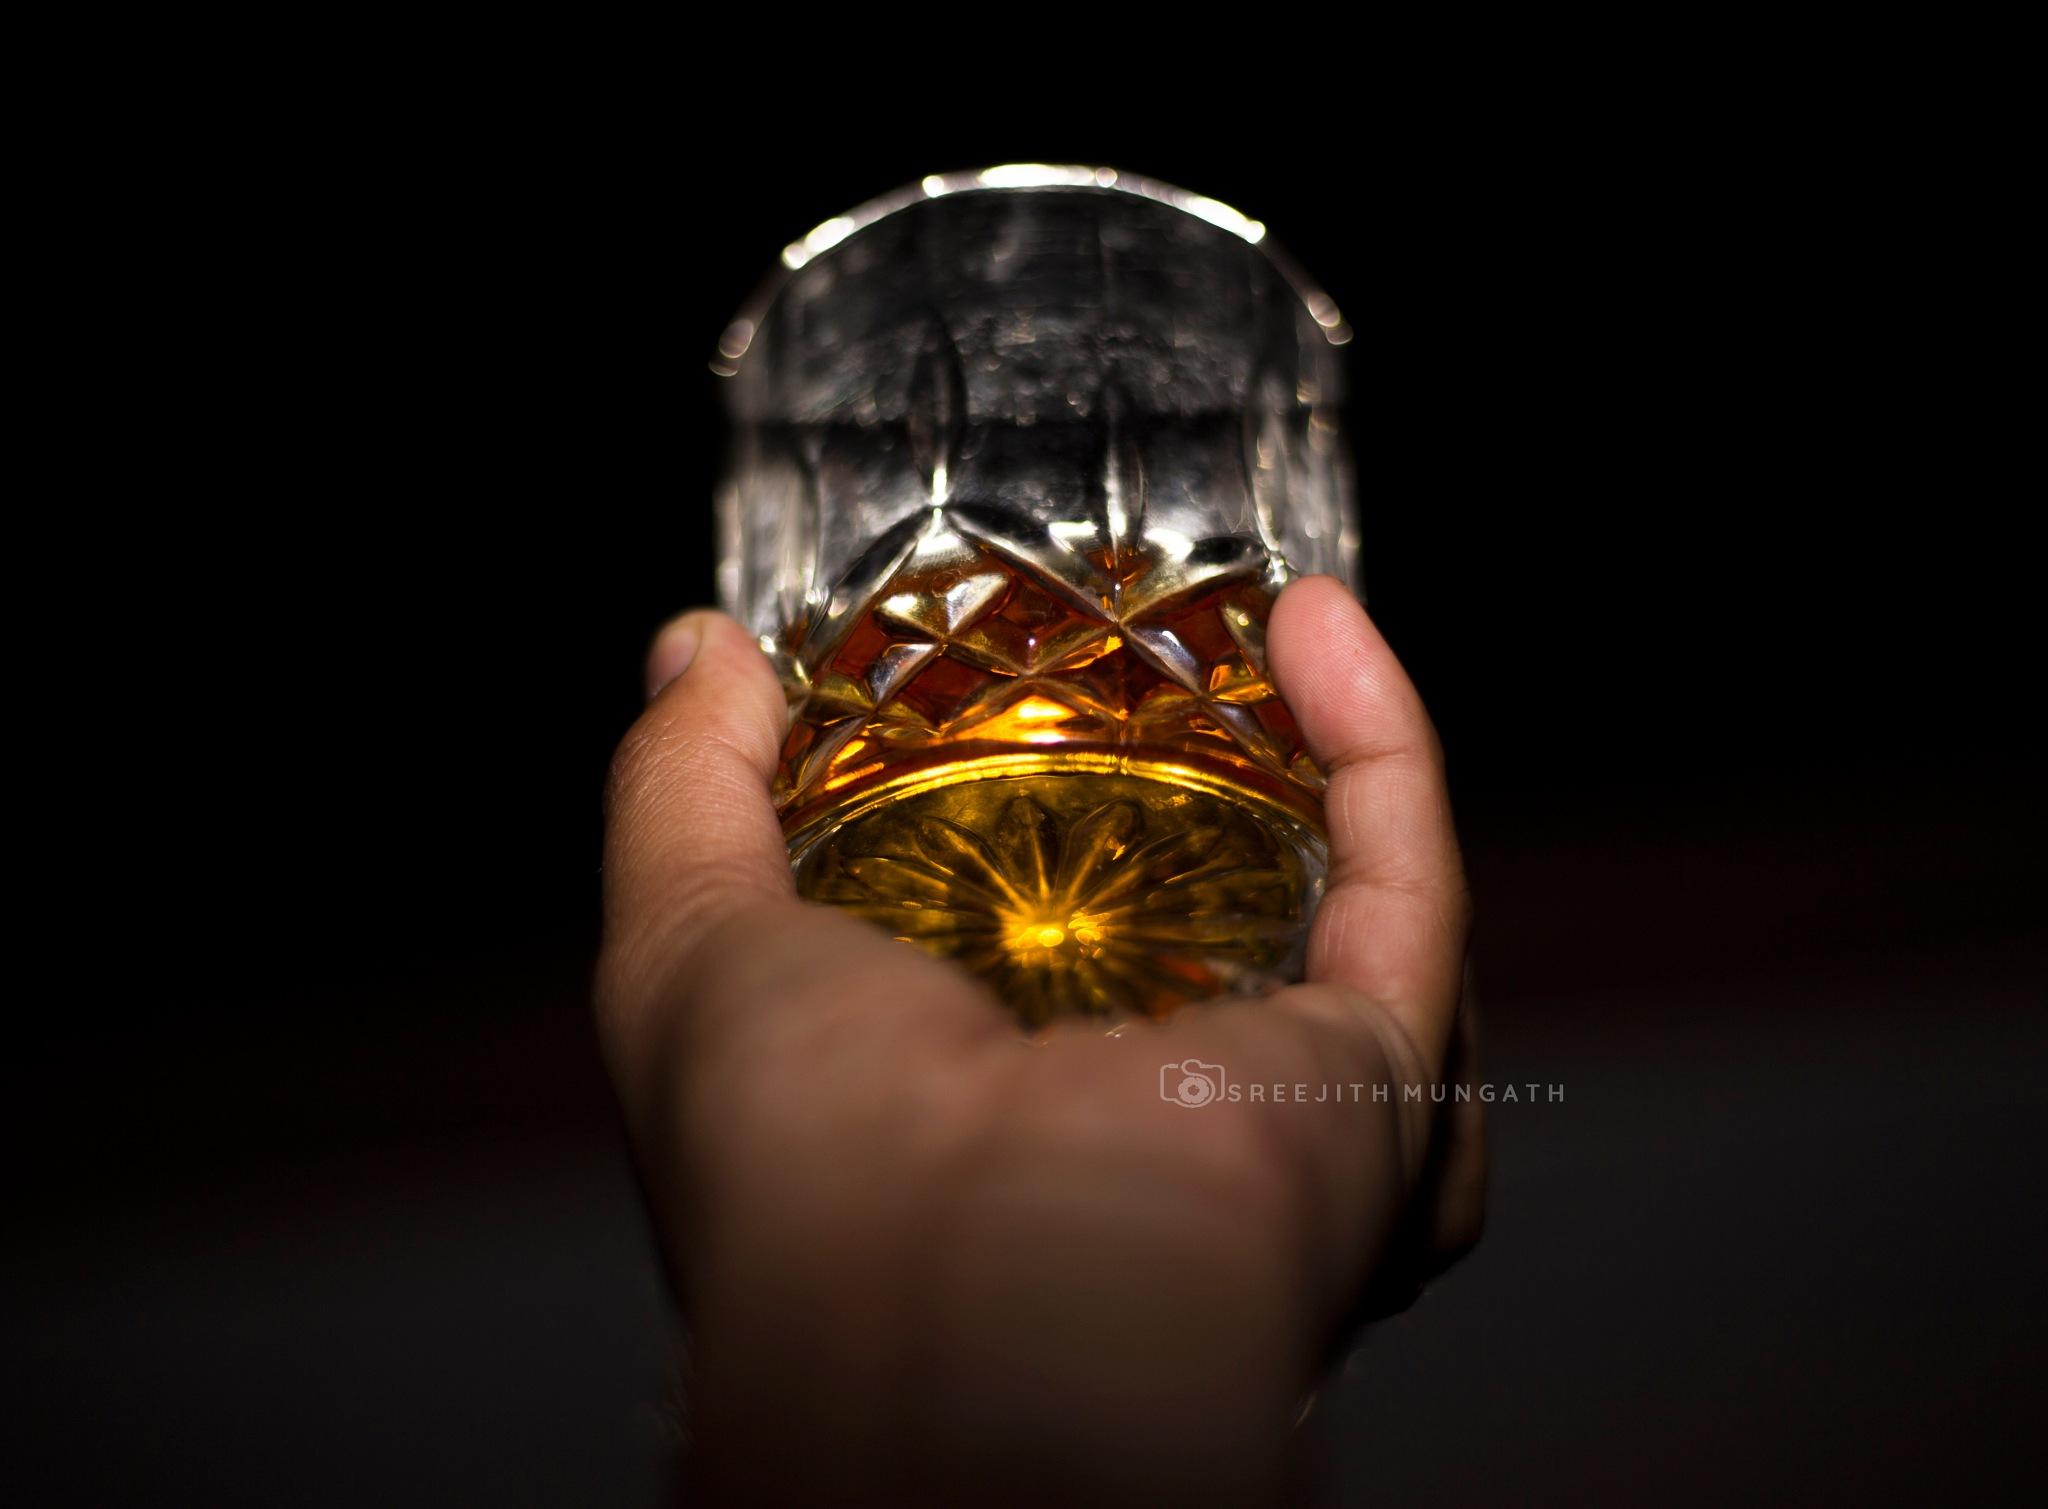 Whiskey by Sreejith Mungath